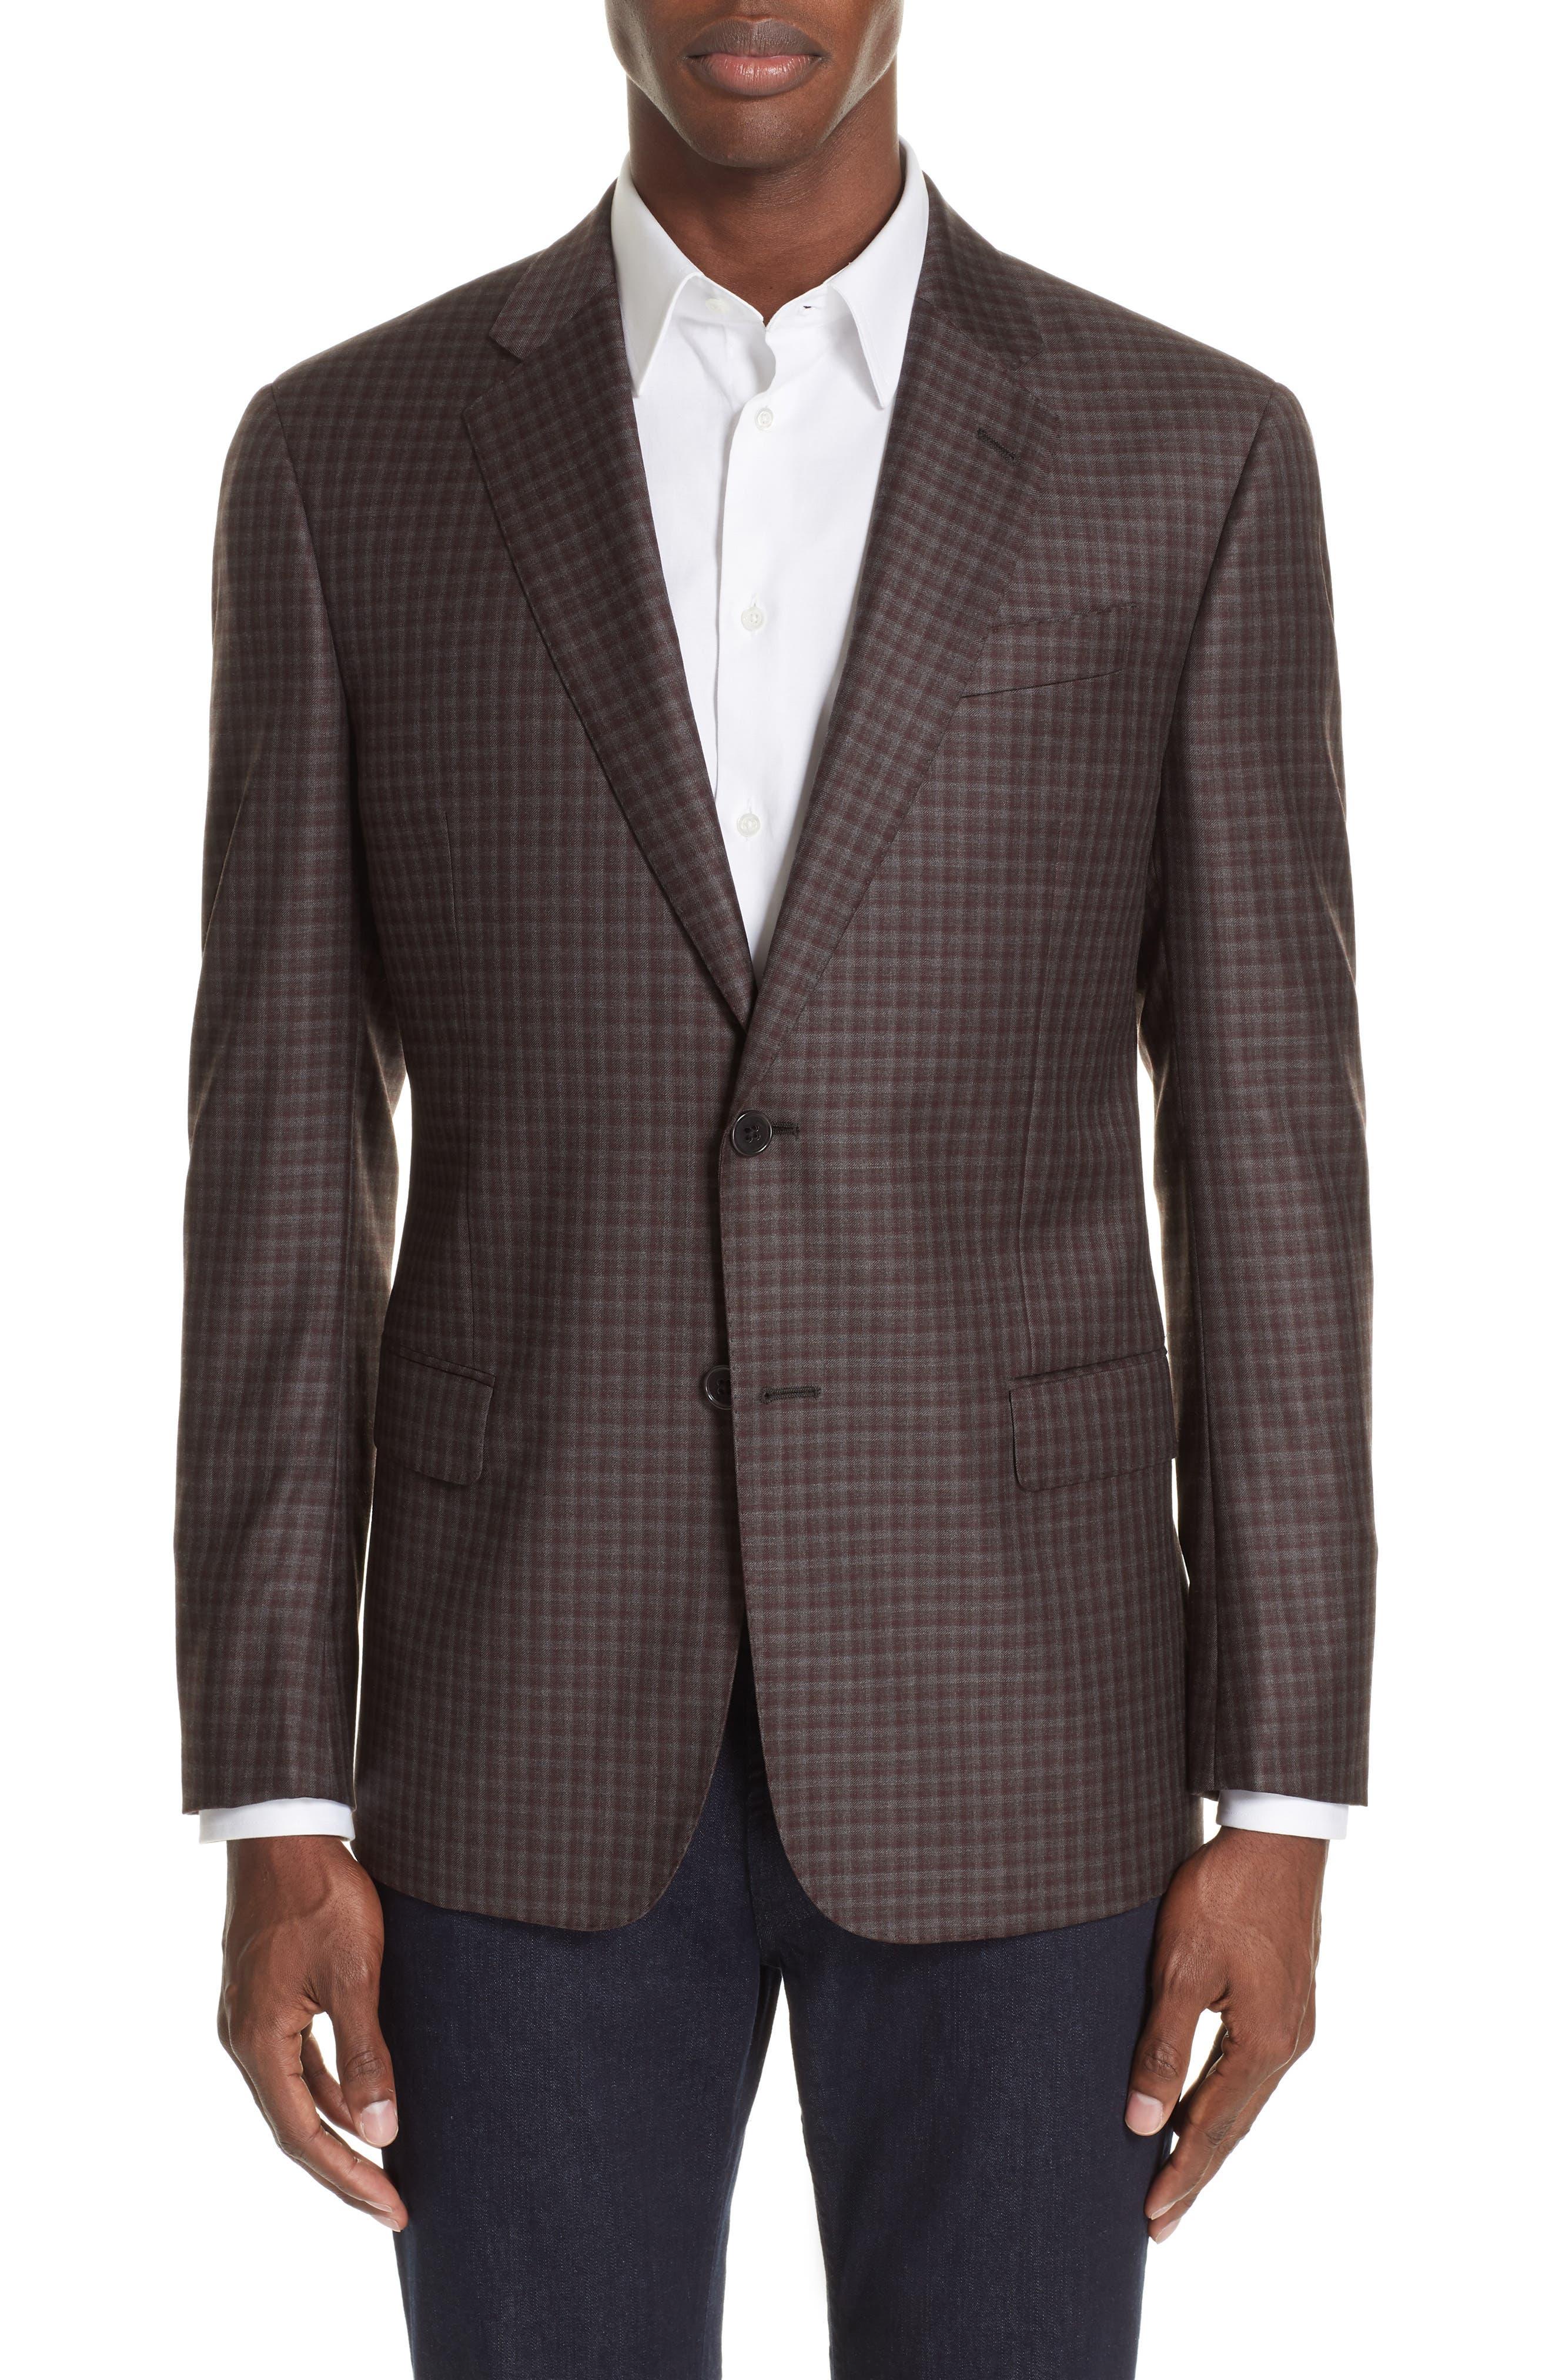 G-Line Trim Fit Plaid Wool Sport Coat,                         Main,                         color, RED/ BROWN